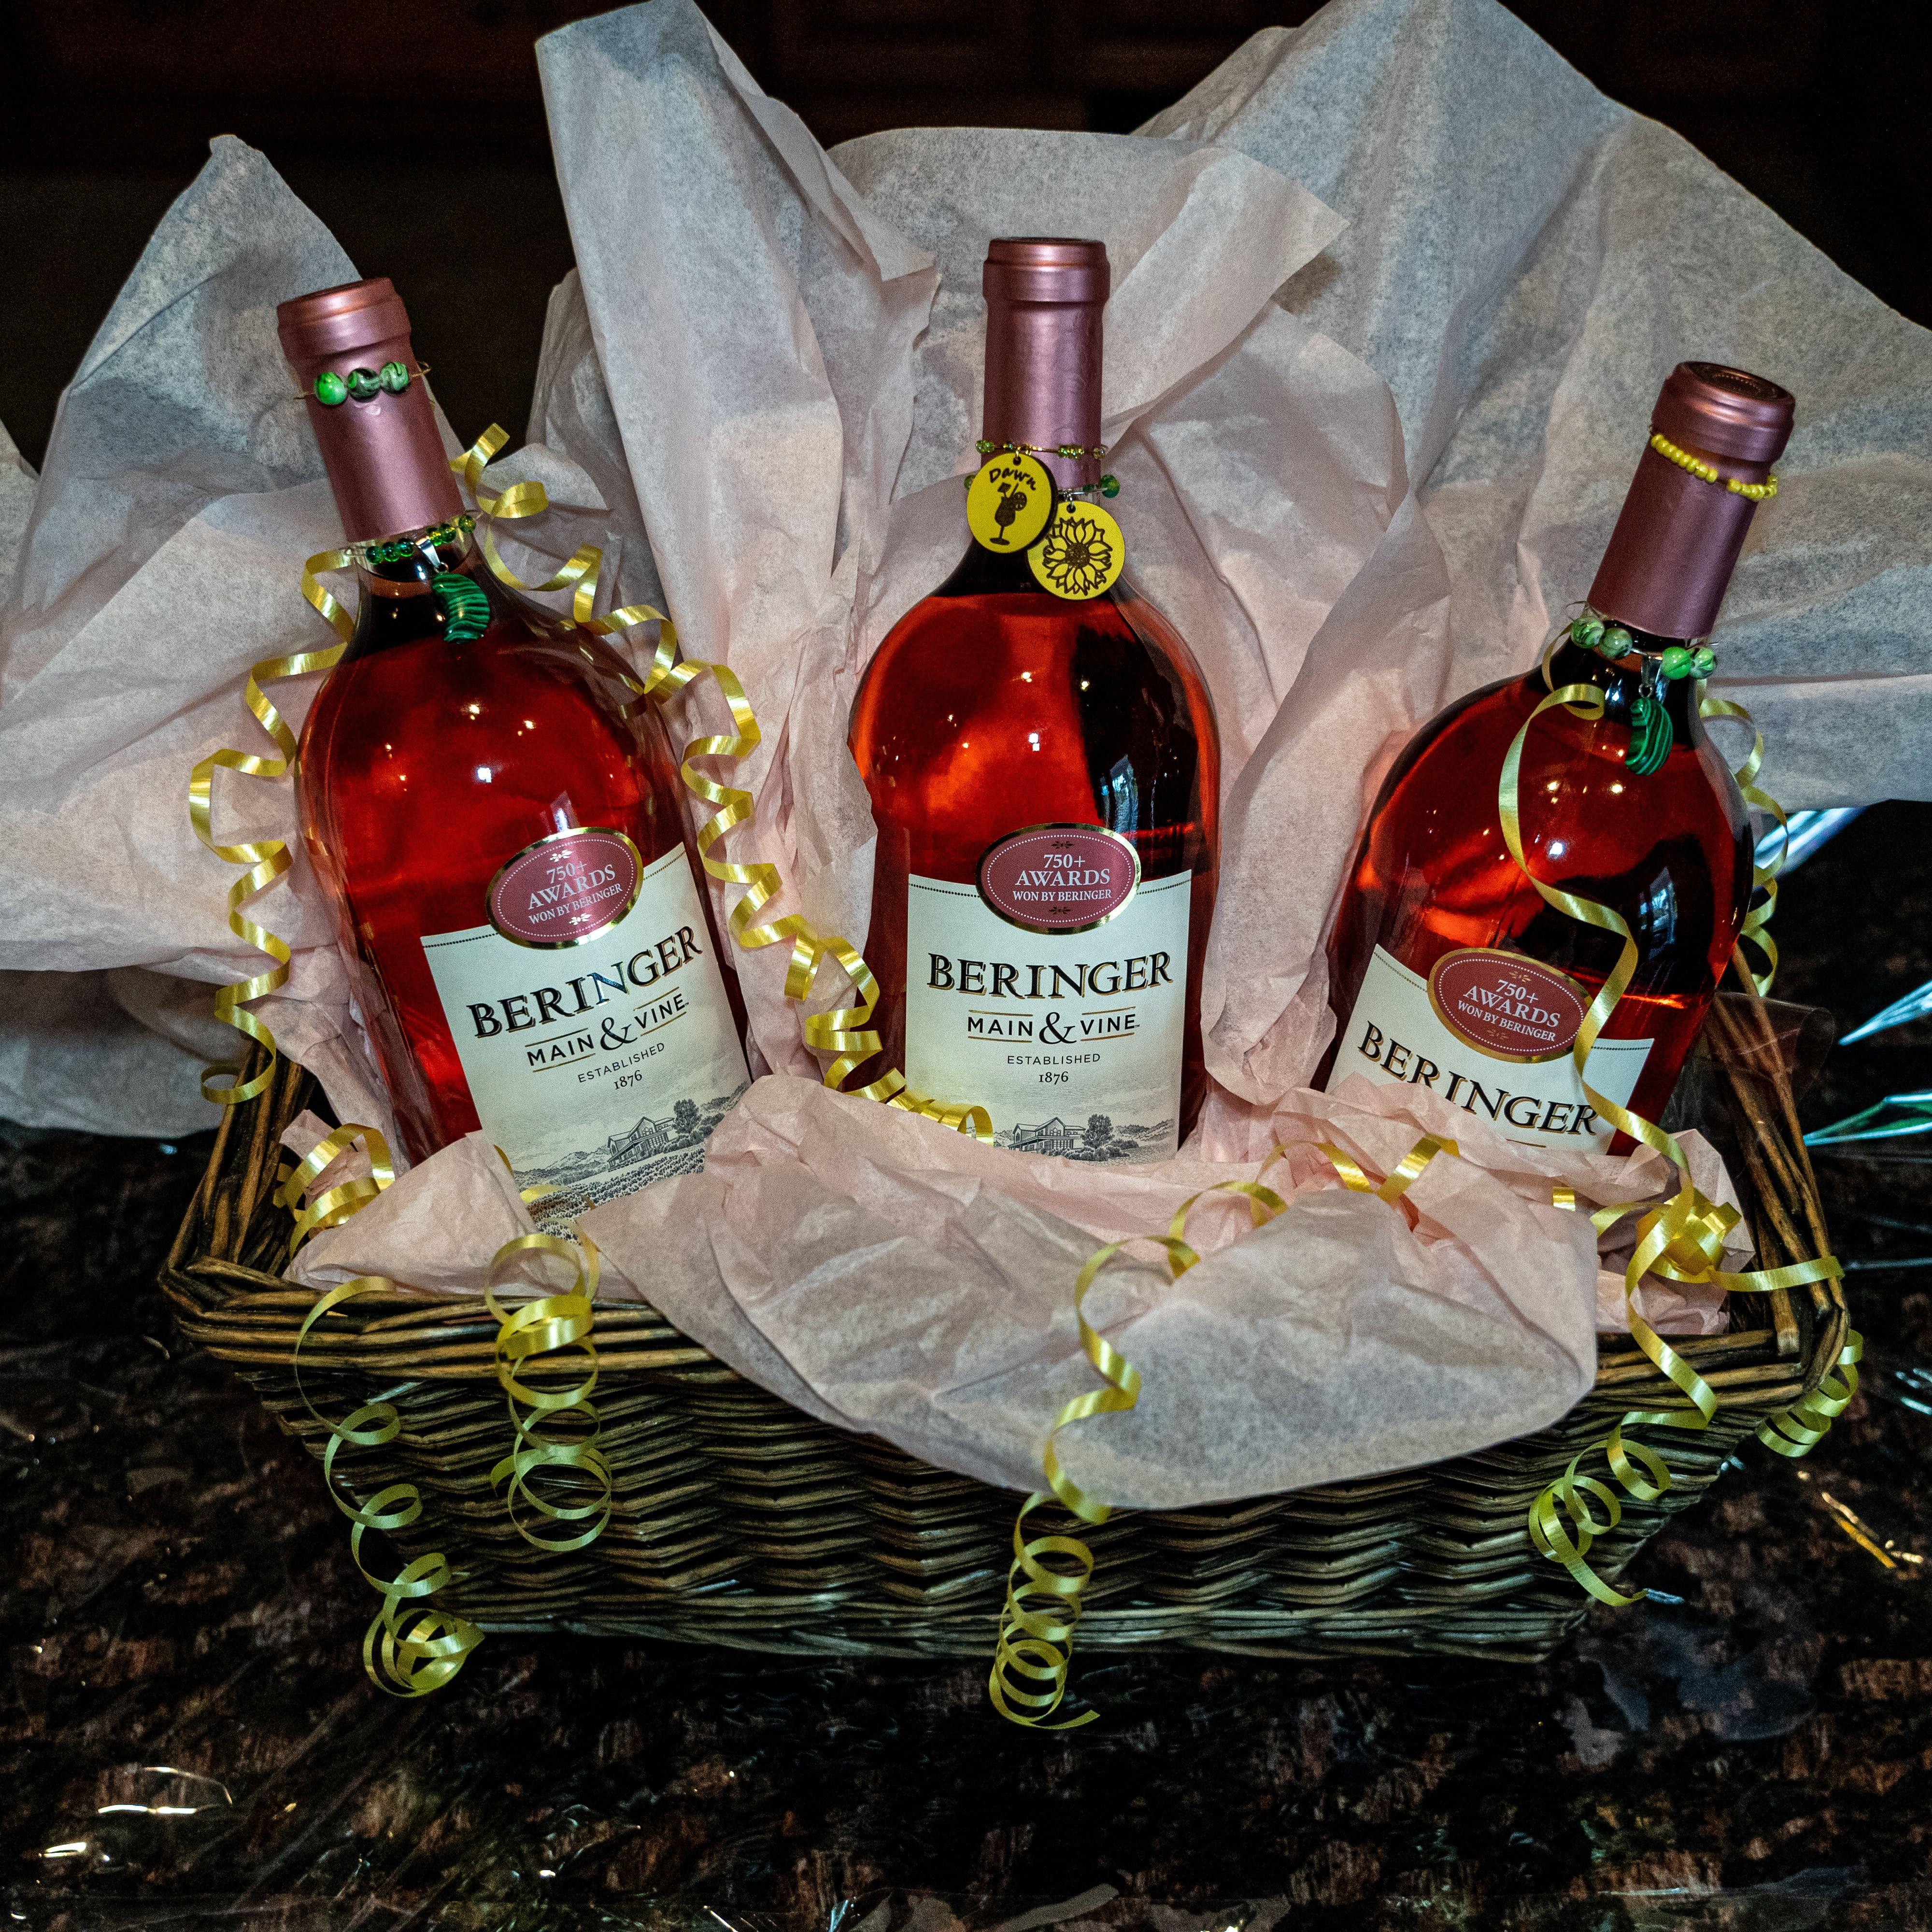 Wine Charm Gift Basket In 2020 Wine Charms Handmade Charm Gift